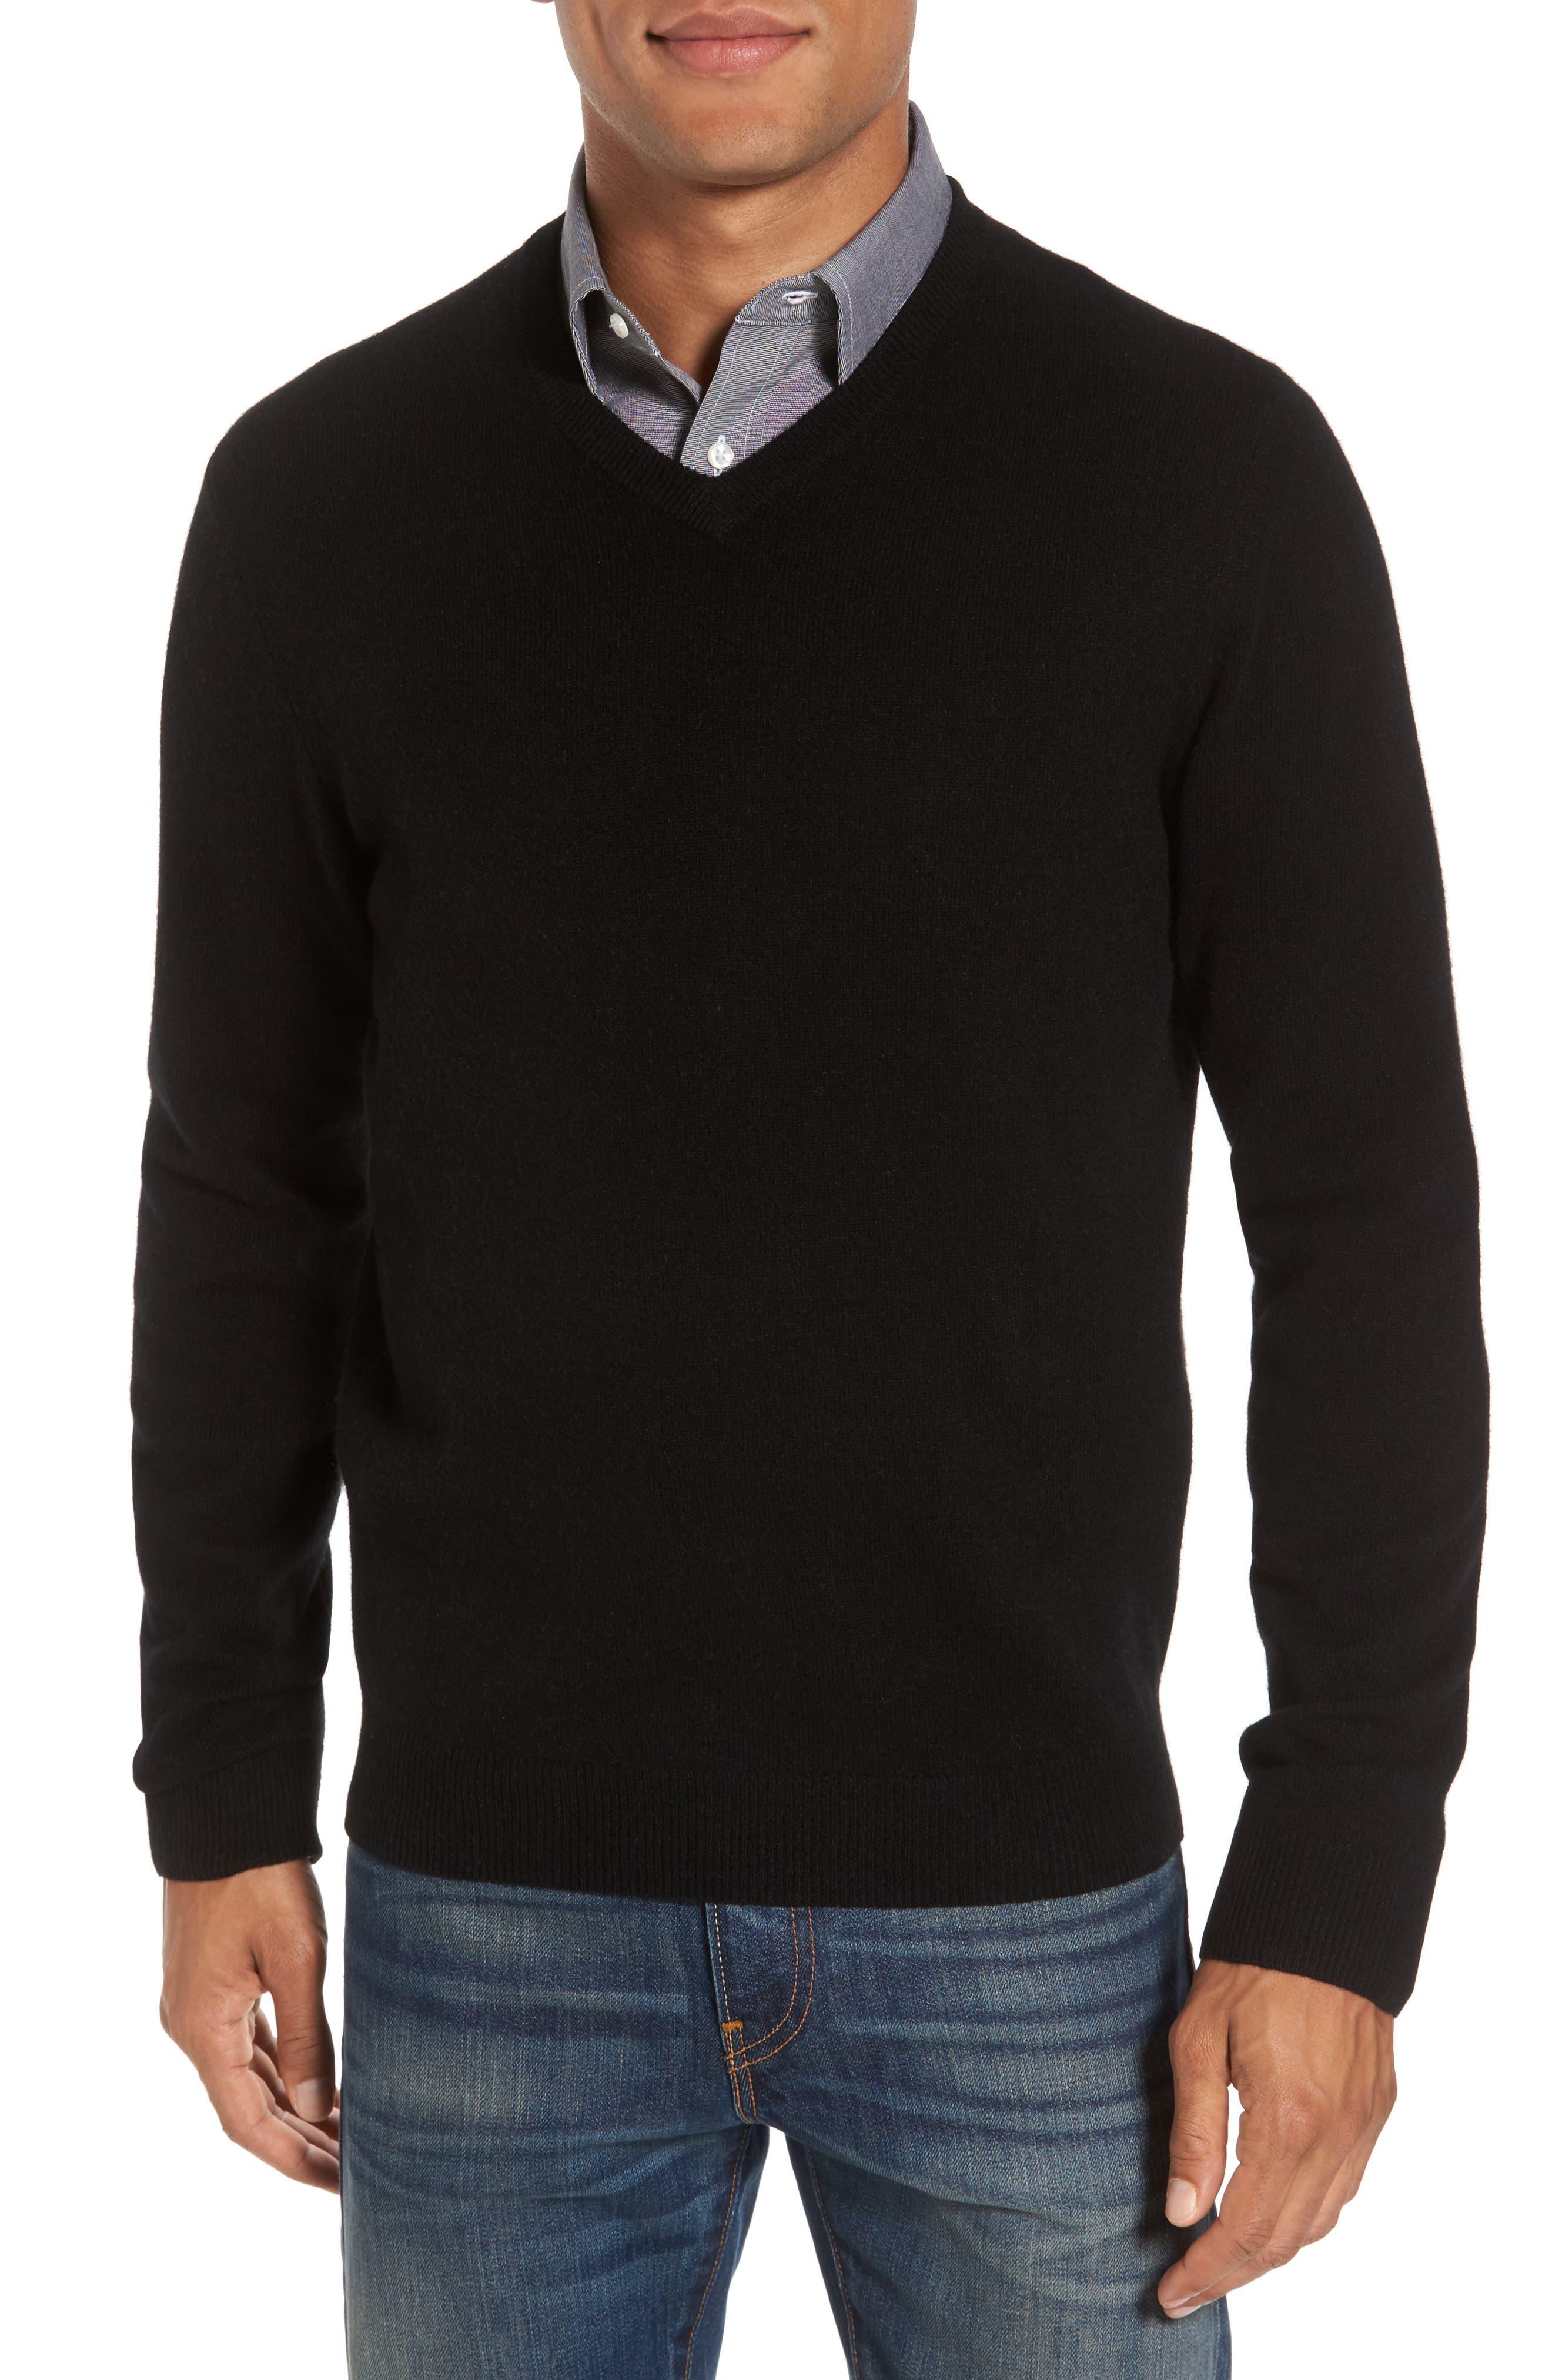 Dress Sweaters for Men